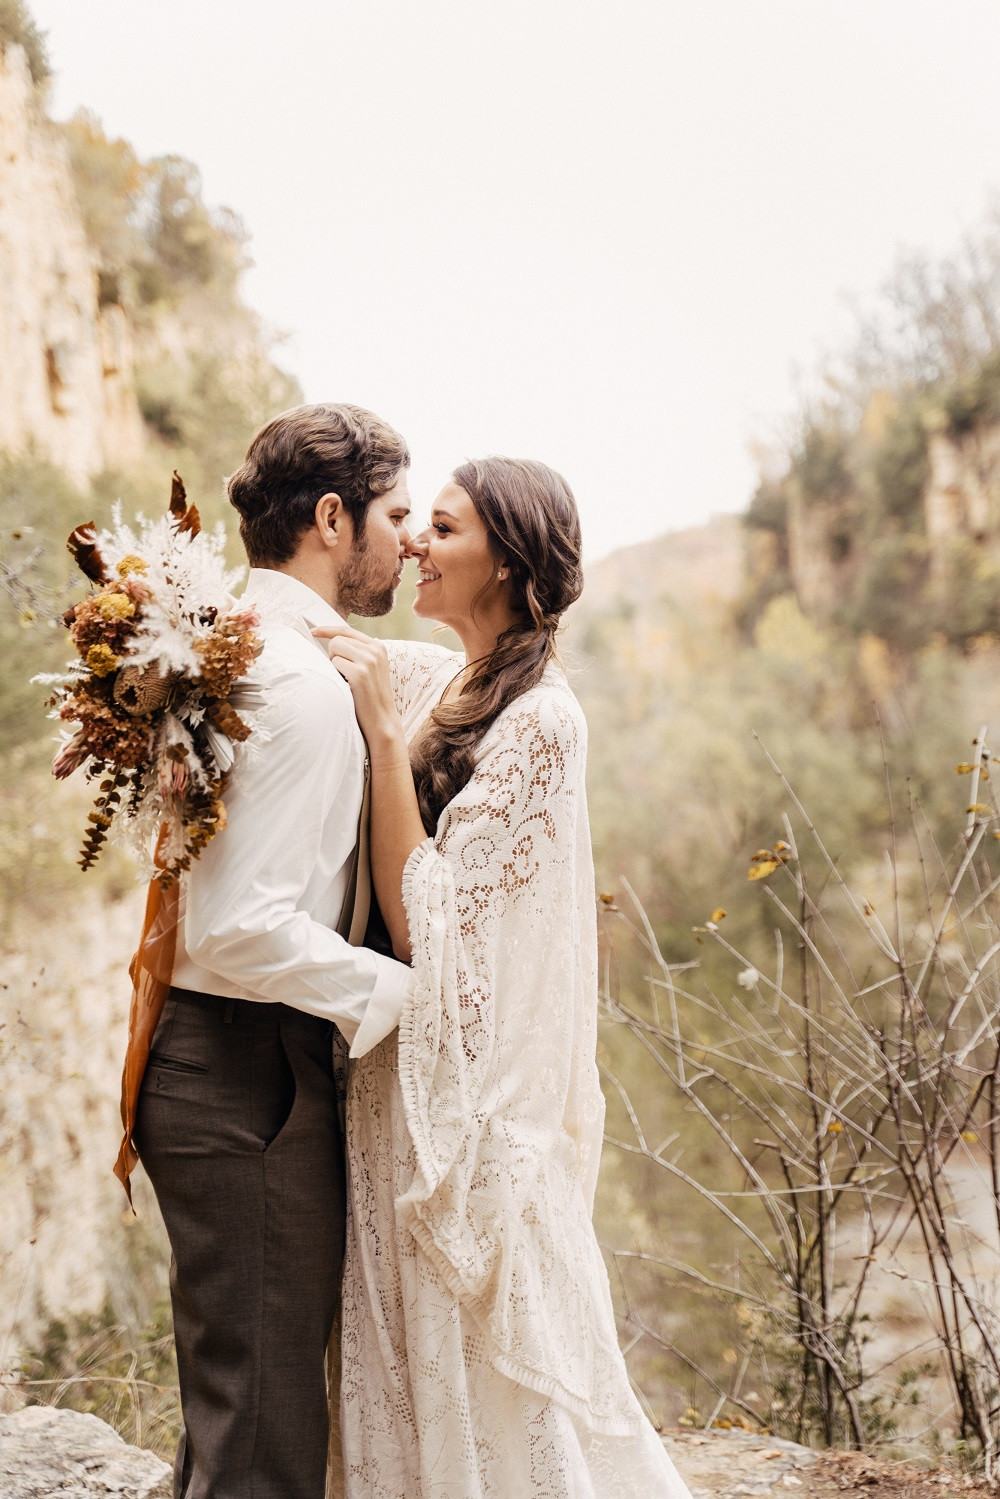 Studio Bloom Iowa boho bride and groom